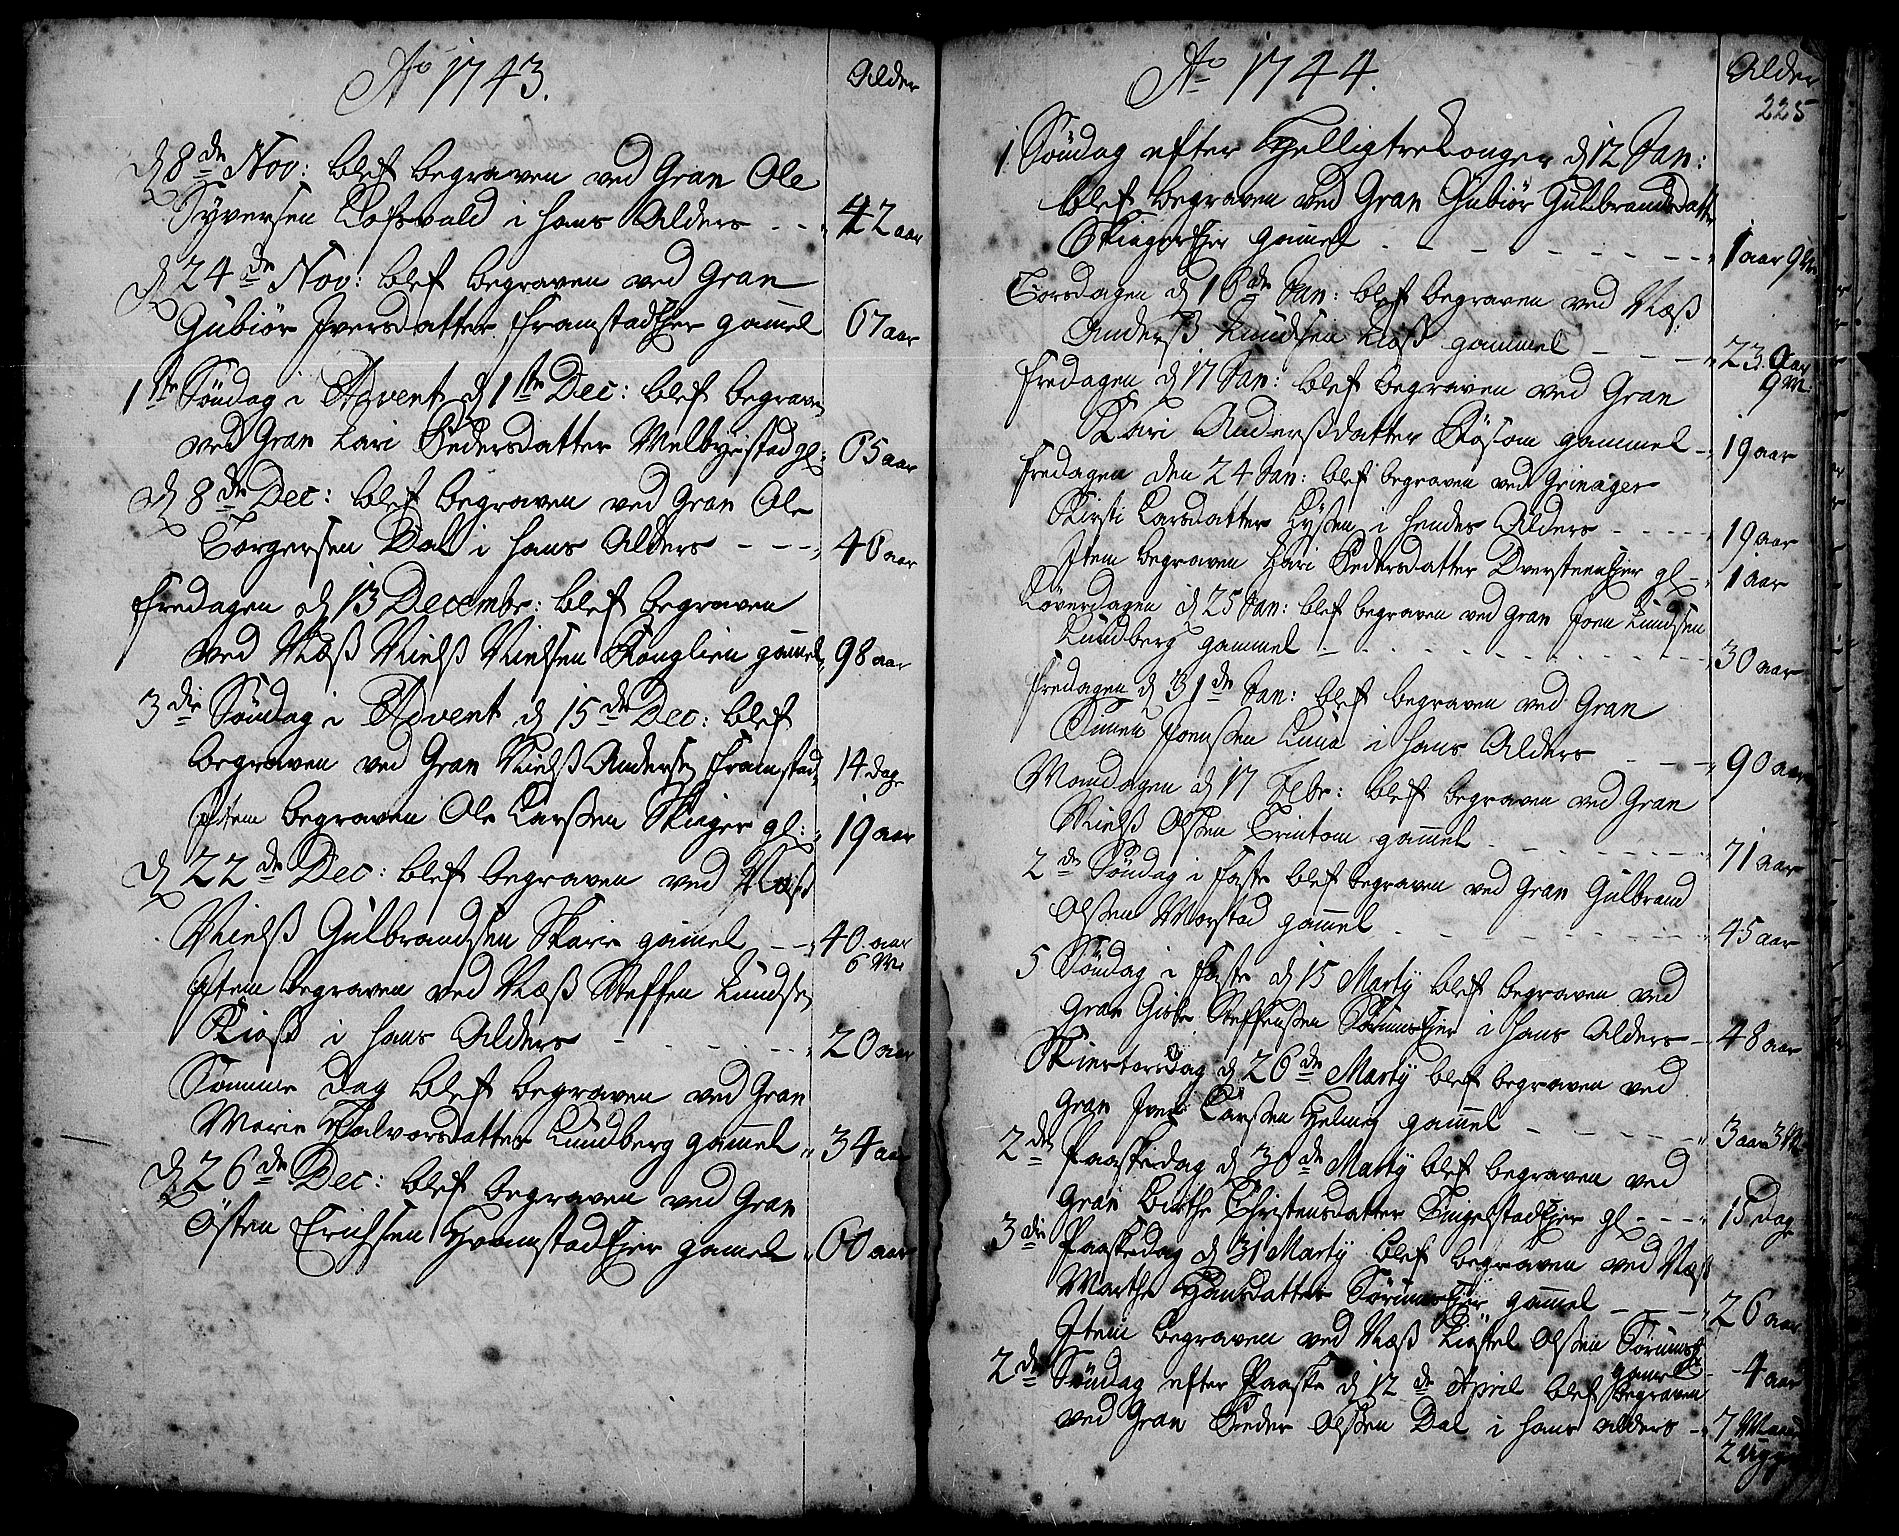 SAH, Gran prestekontor, Ministerialbok nr. 2, 1732-1744, s. 225